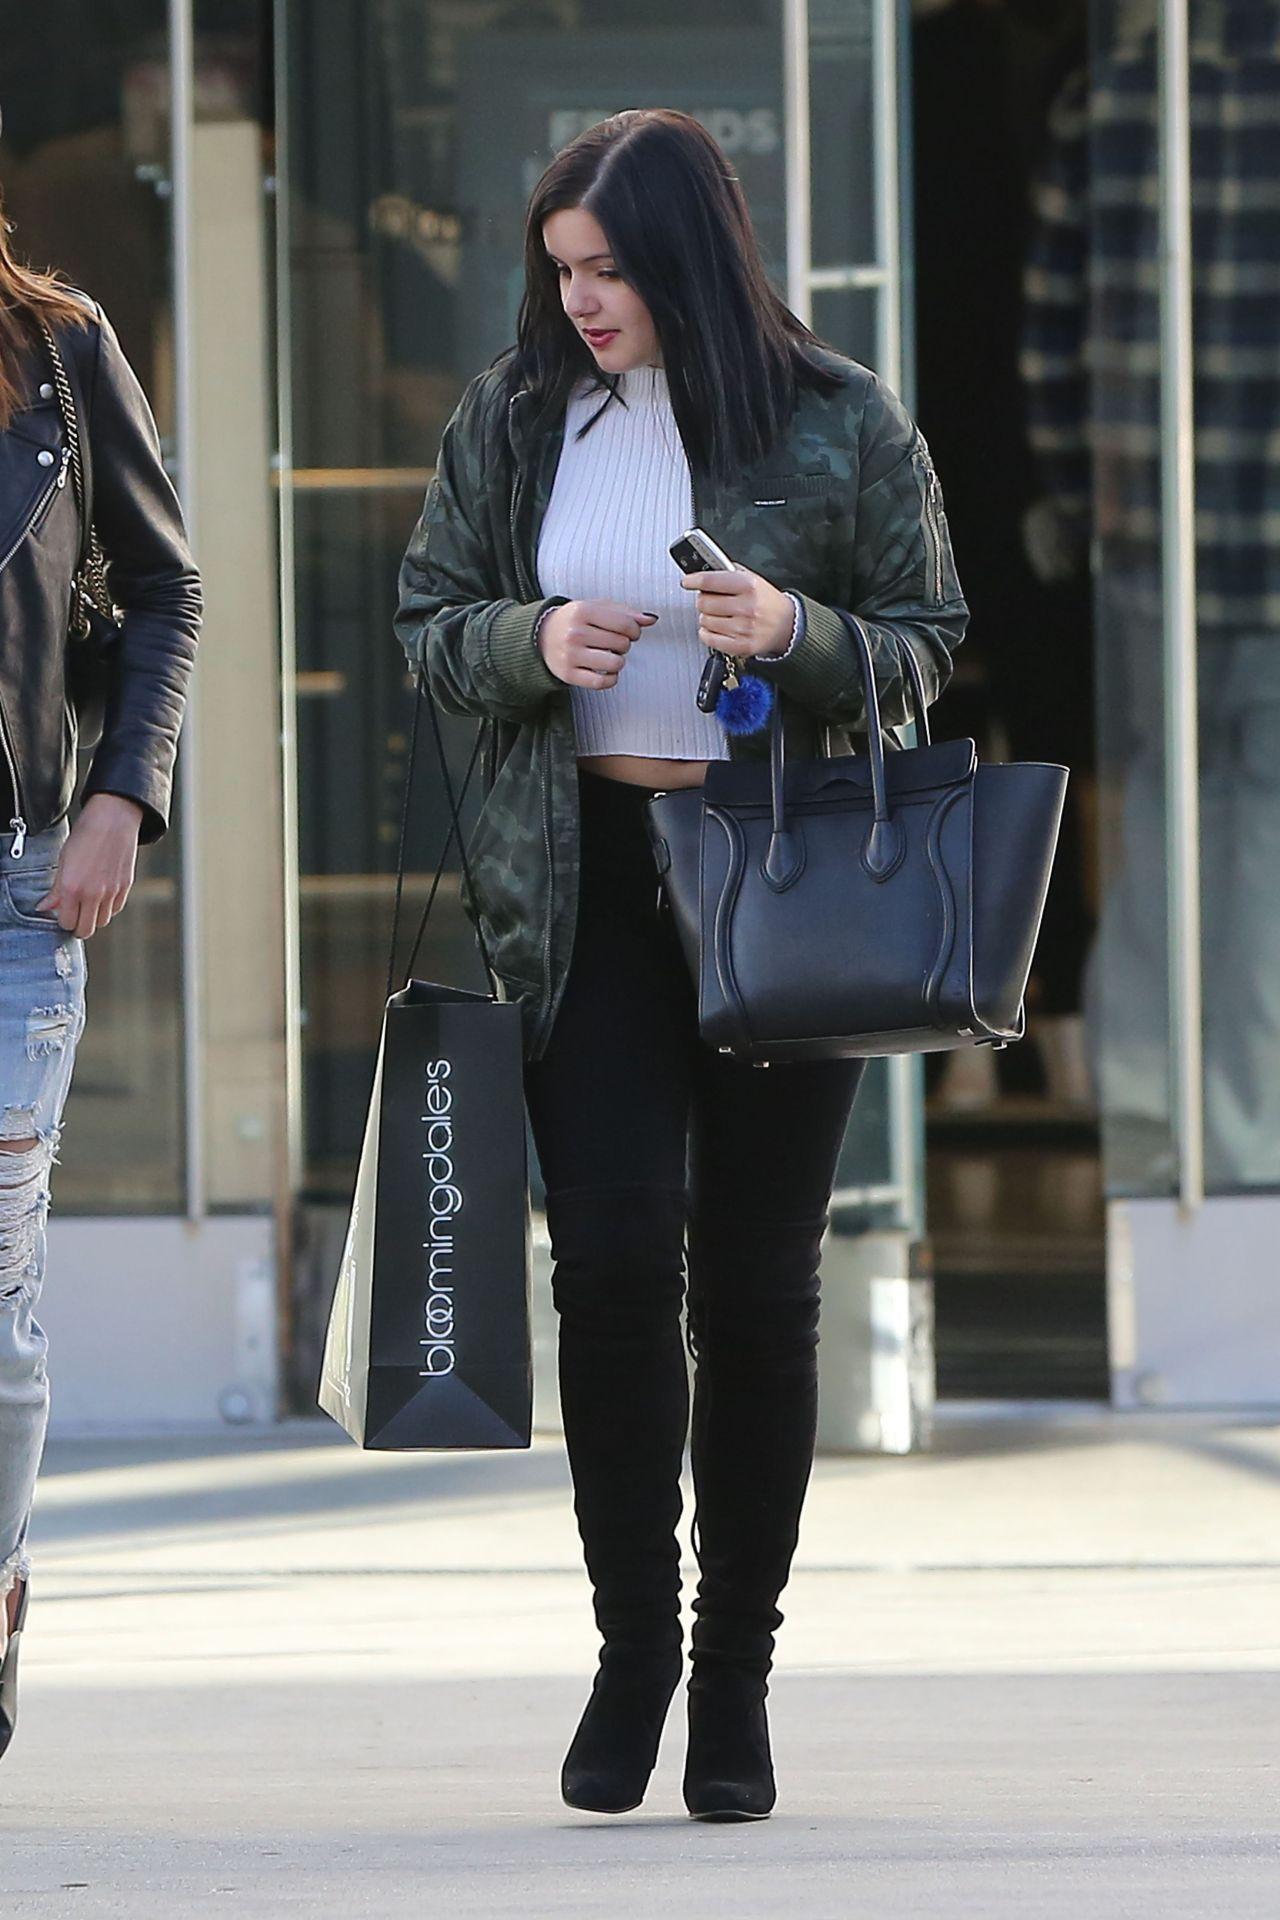 0ca3ec23fb4c Ariel Winter #ArielWinter Shopping at The Westfield Shopping Center in  Sherman Oaks Dec-2016 Celebstills A Ariel Winter